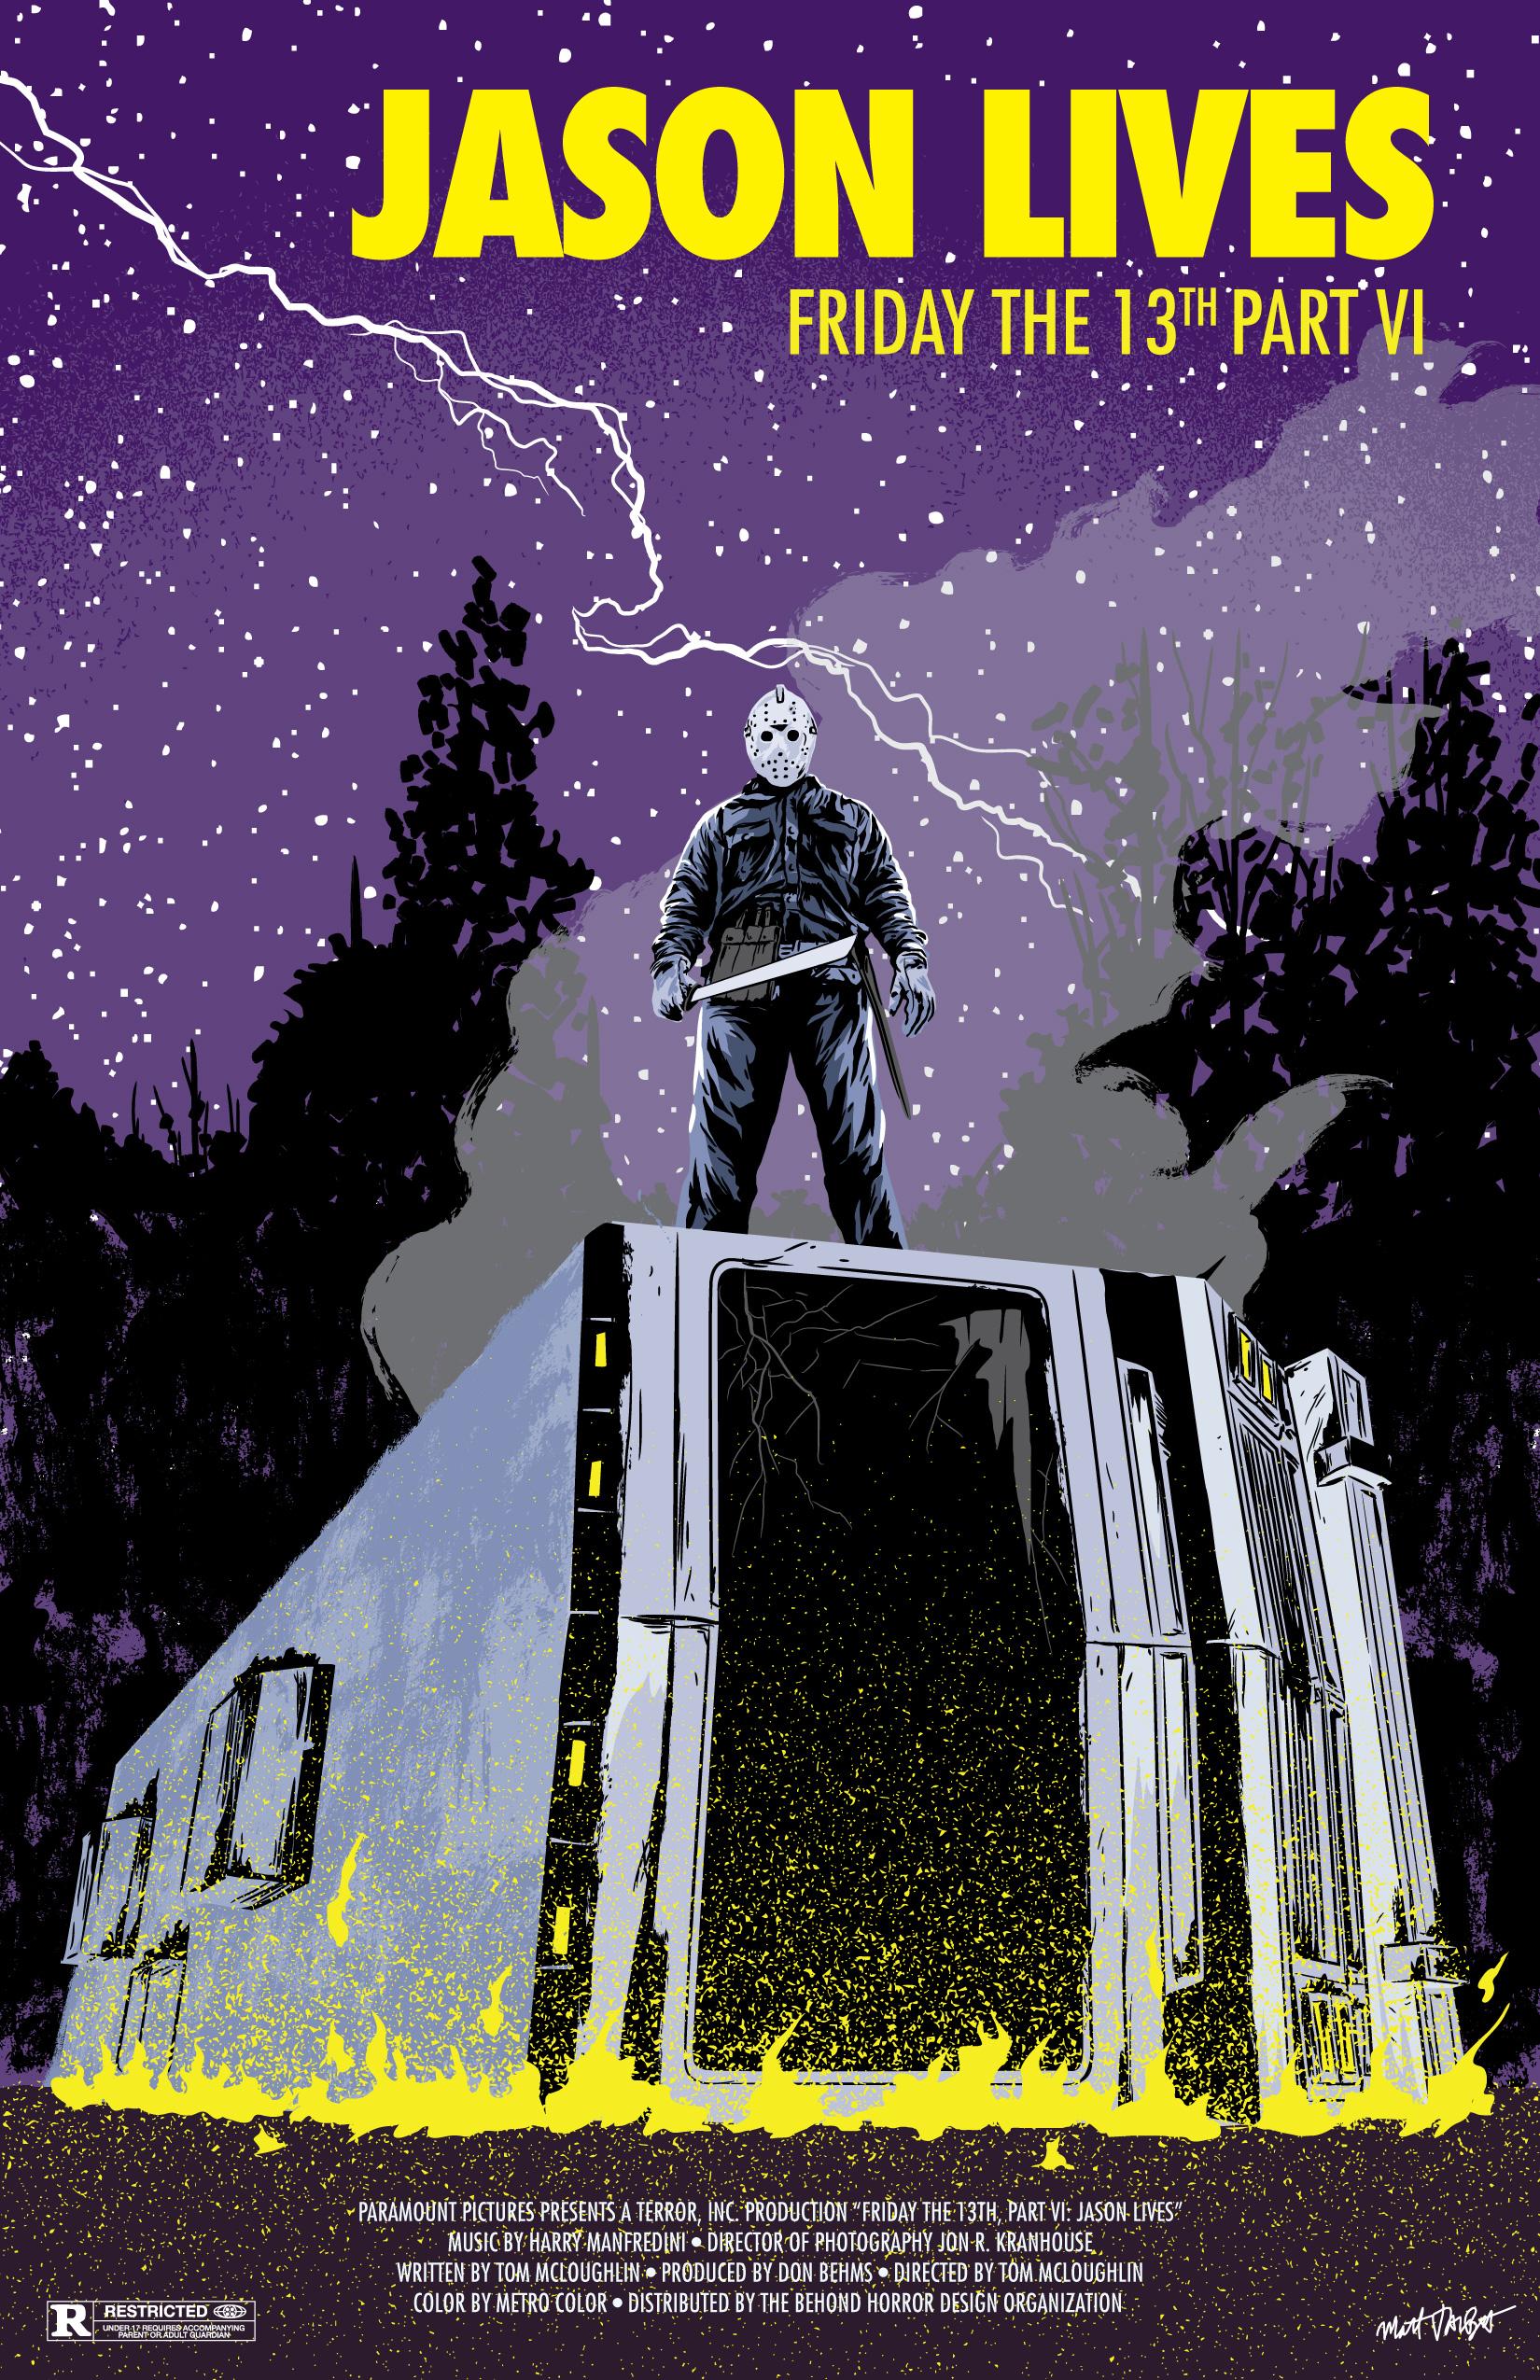 Friday the 13th Part VI Jason Lives Poster by Matt Talbot